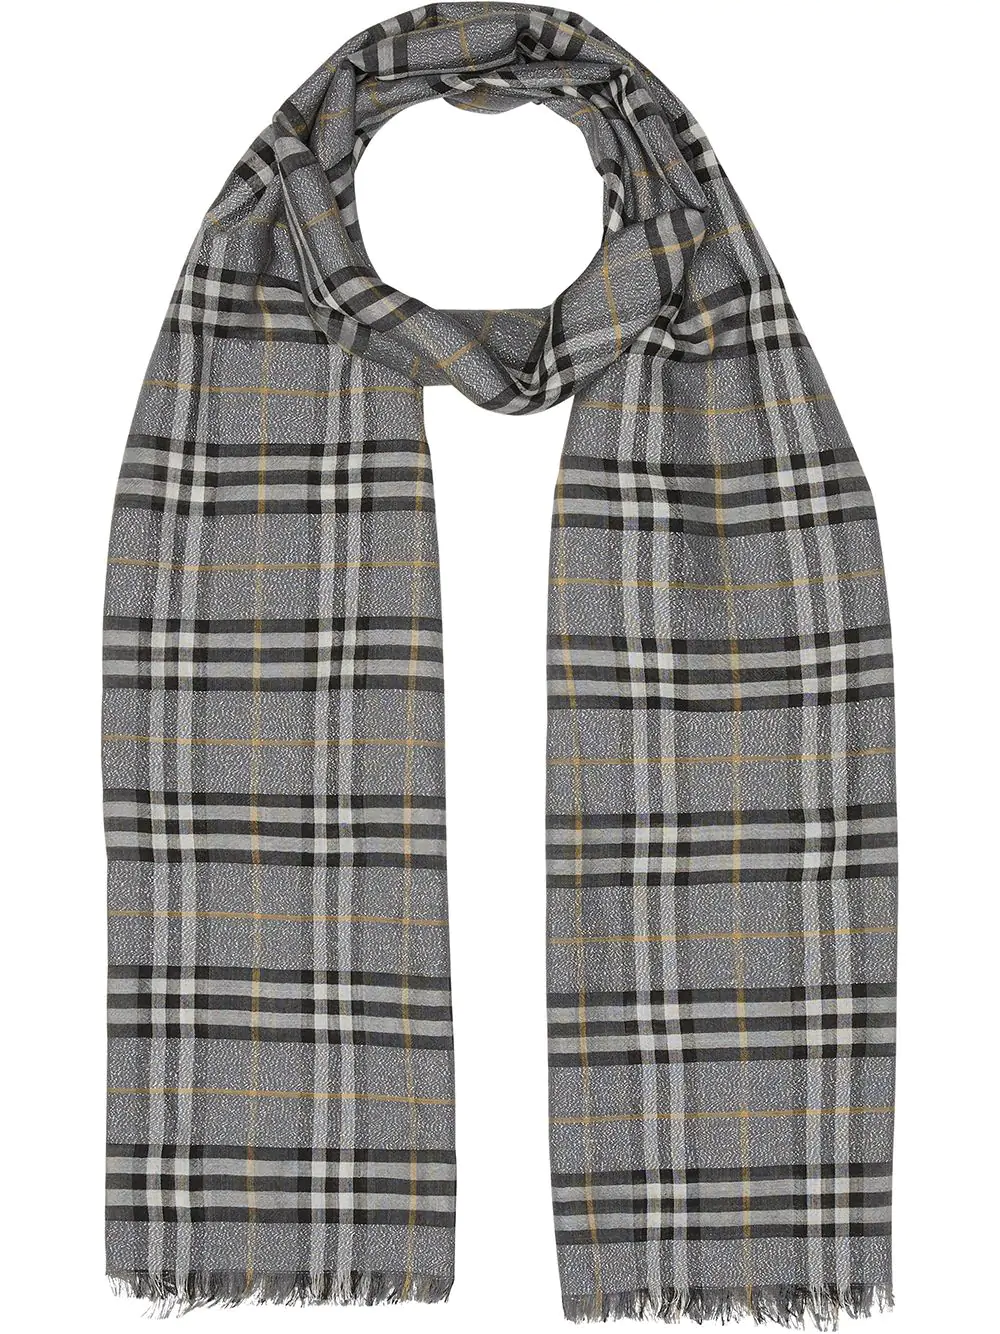 8303adf0b4 Burberry Metallic Vintage Check Wool Silk Blend Scarf In Grey | ModeSens